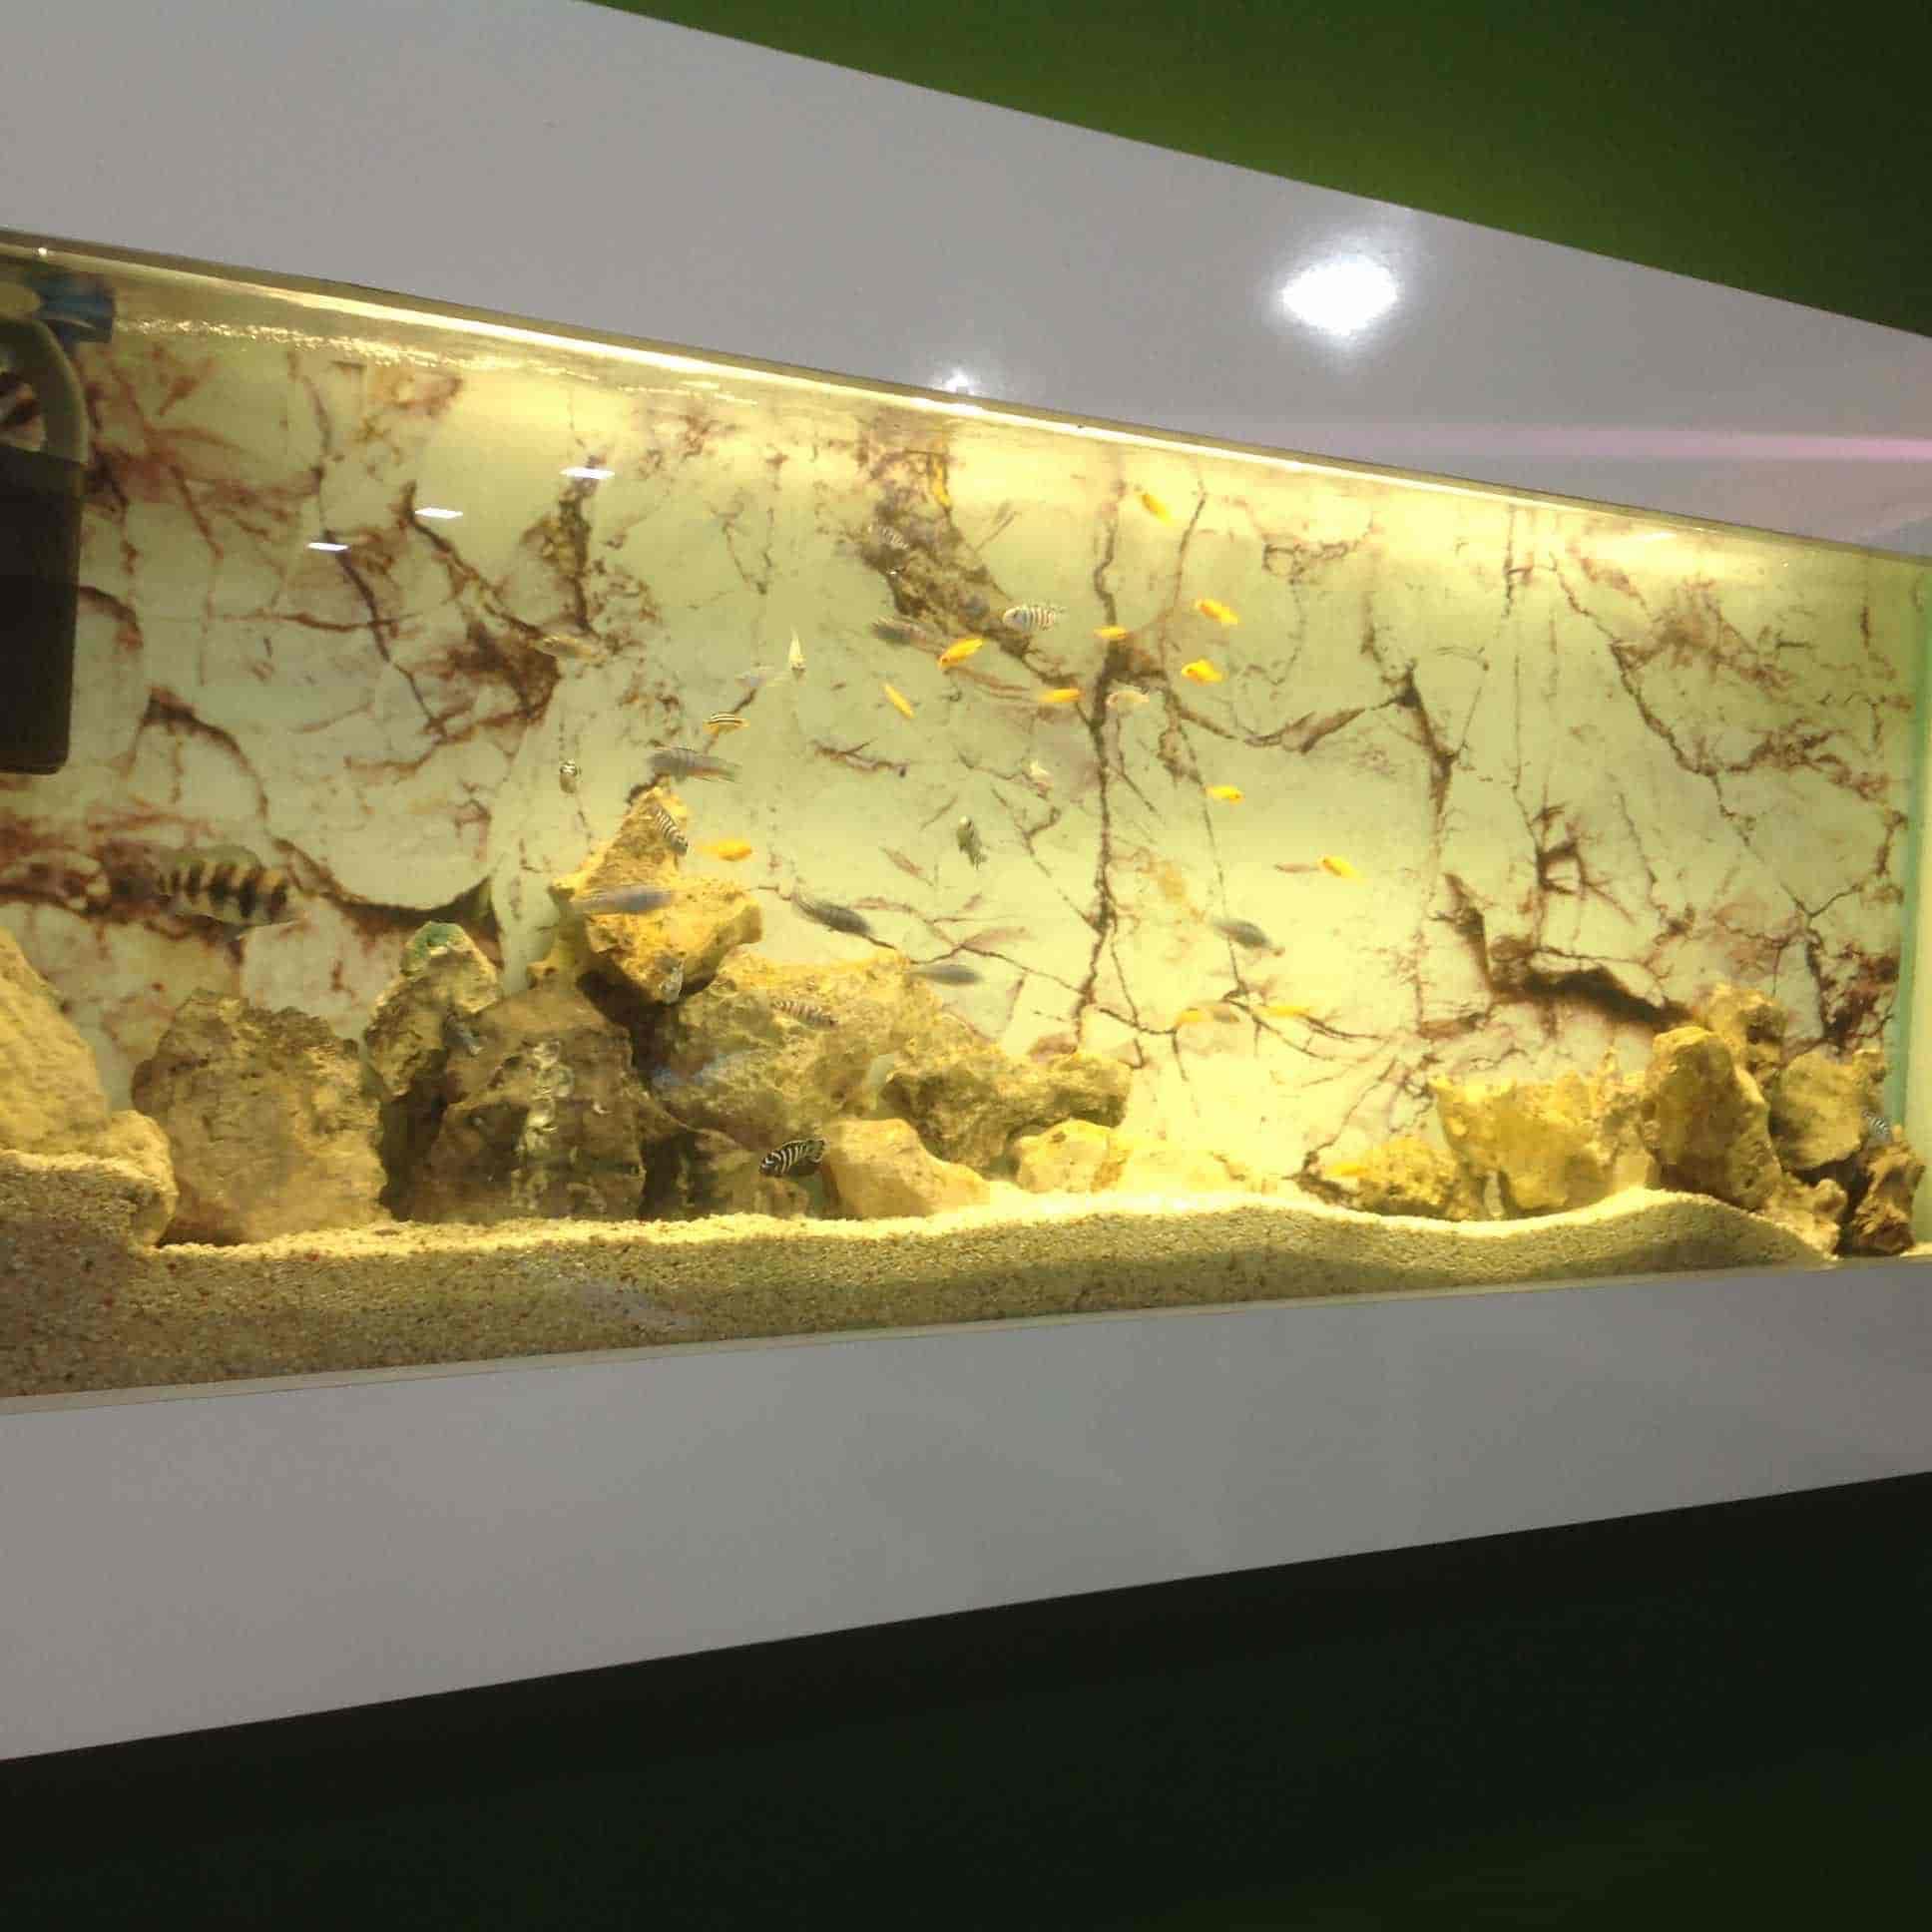 Enchanting Aquarium Rock Wall Decoration Gallery - Art & Wall Decor ...